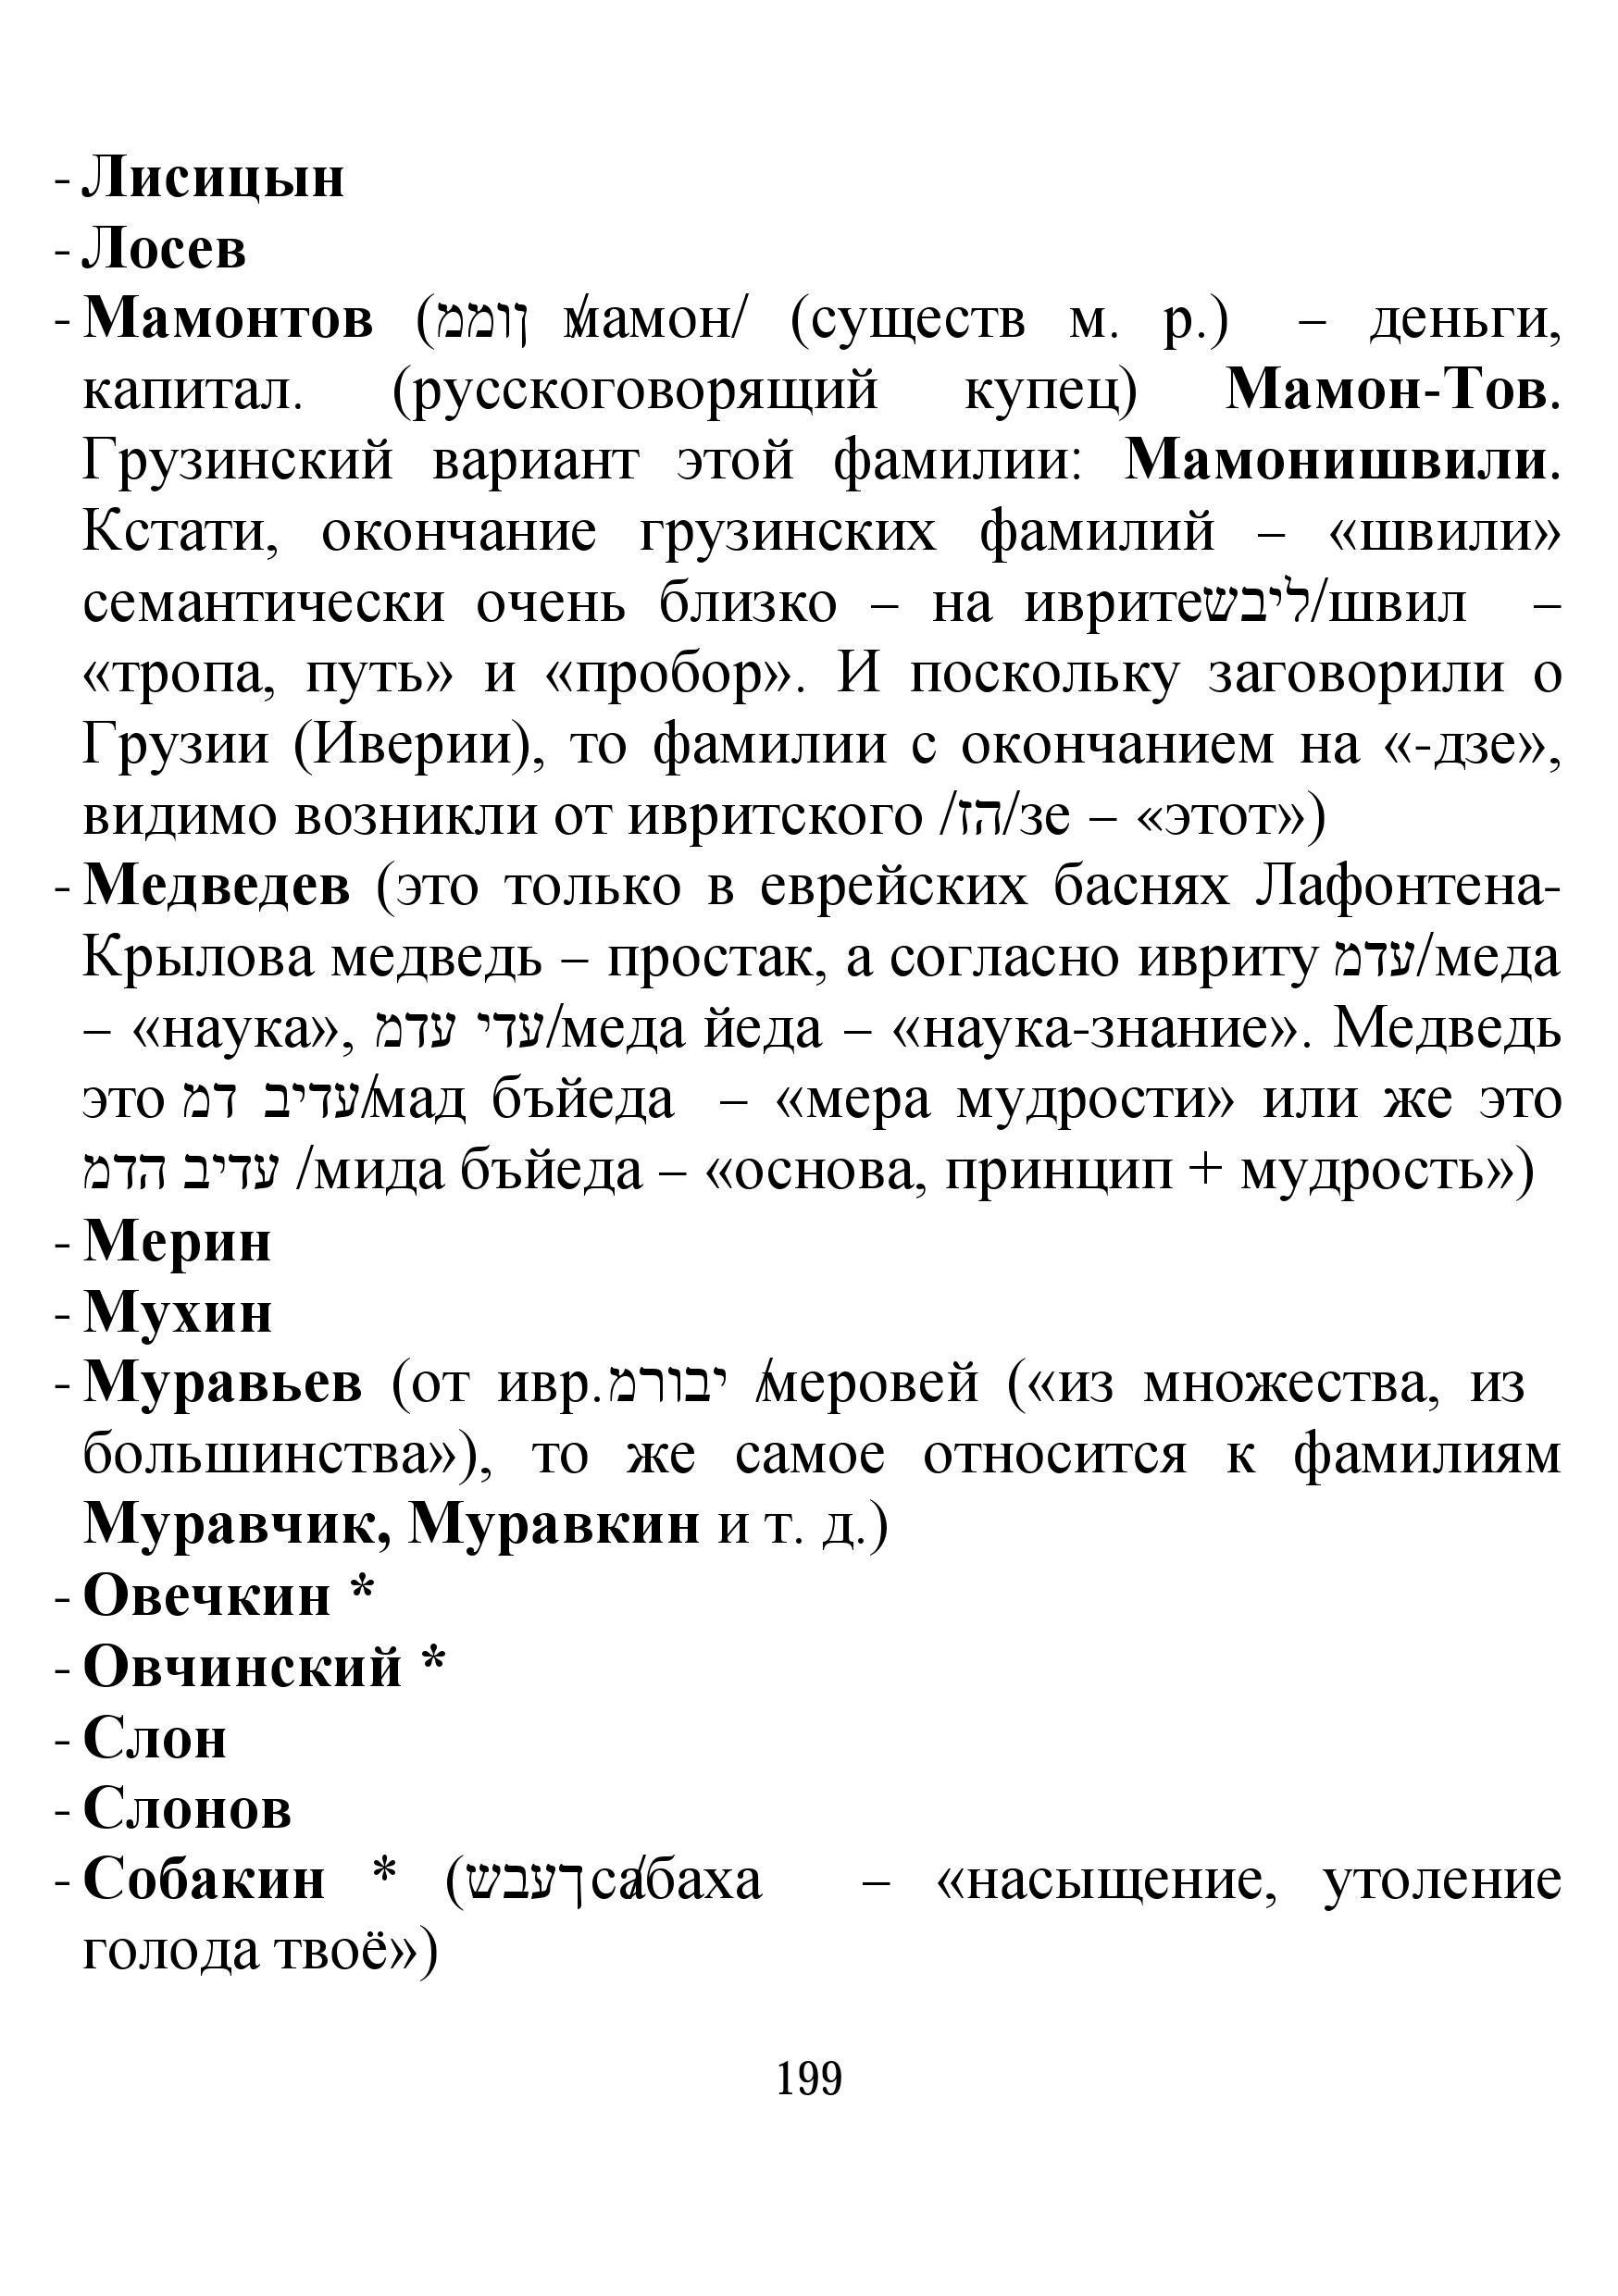 http://s8.uploads.ru/g8Eqs.jpg